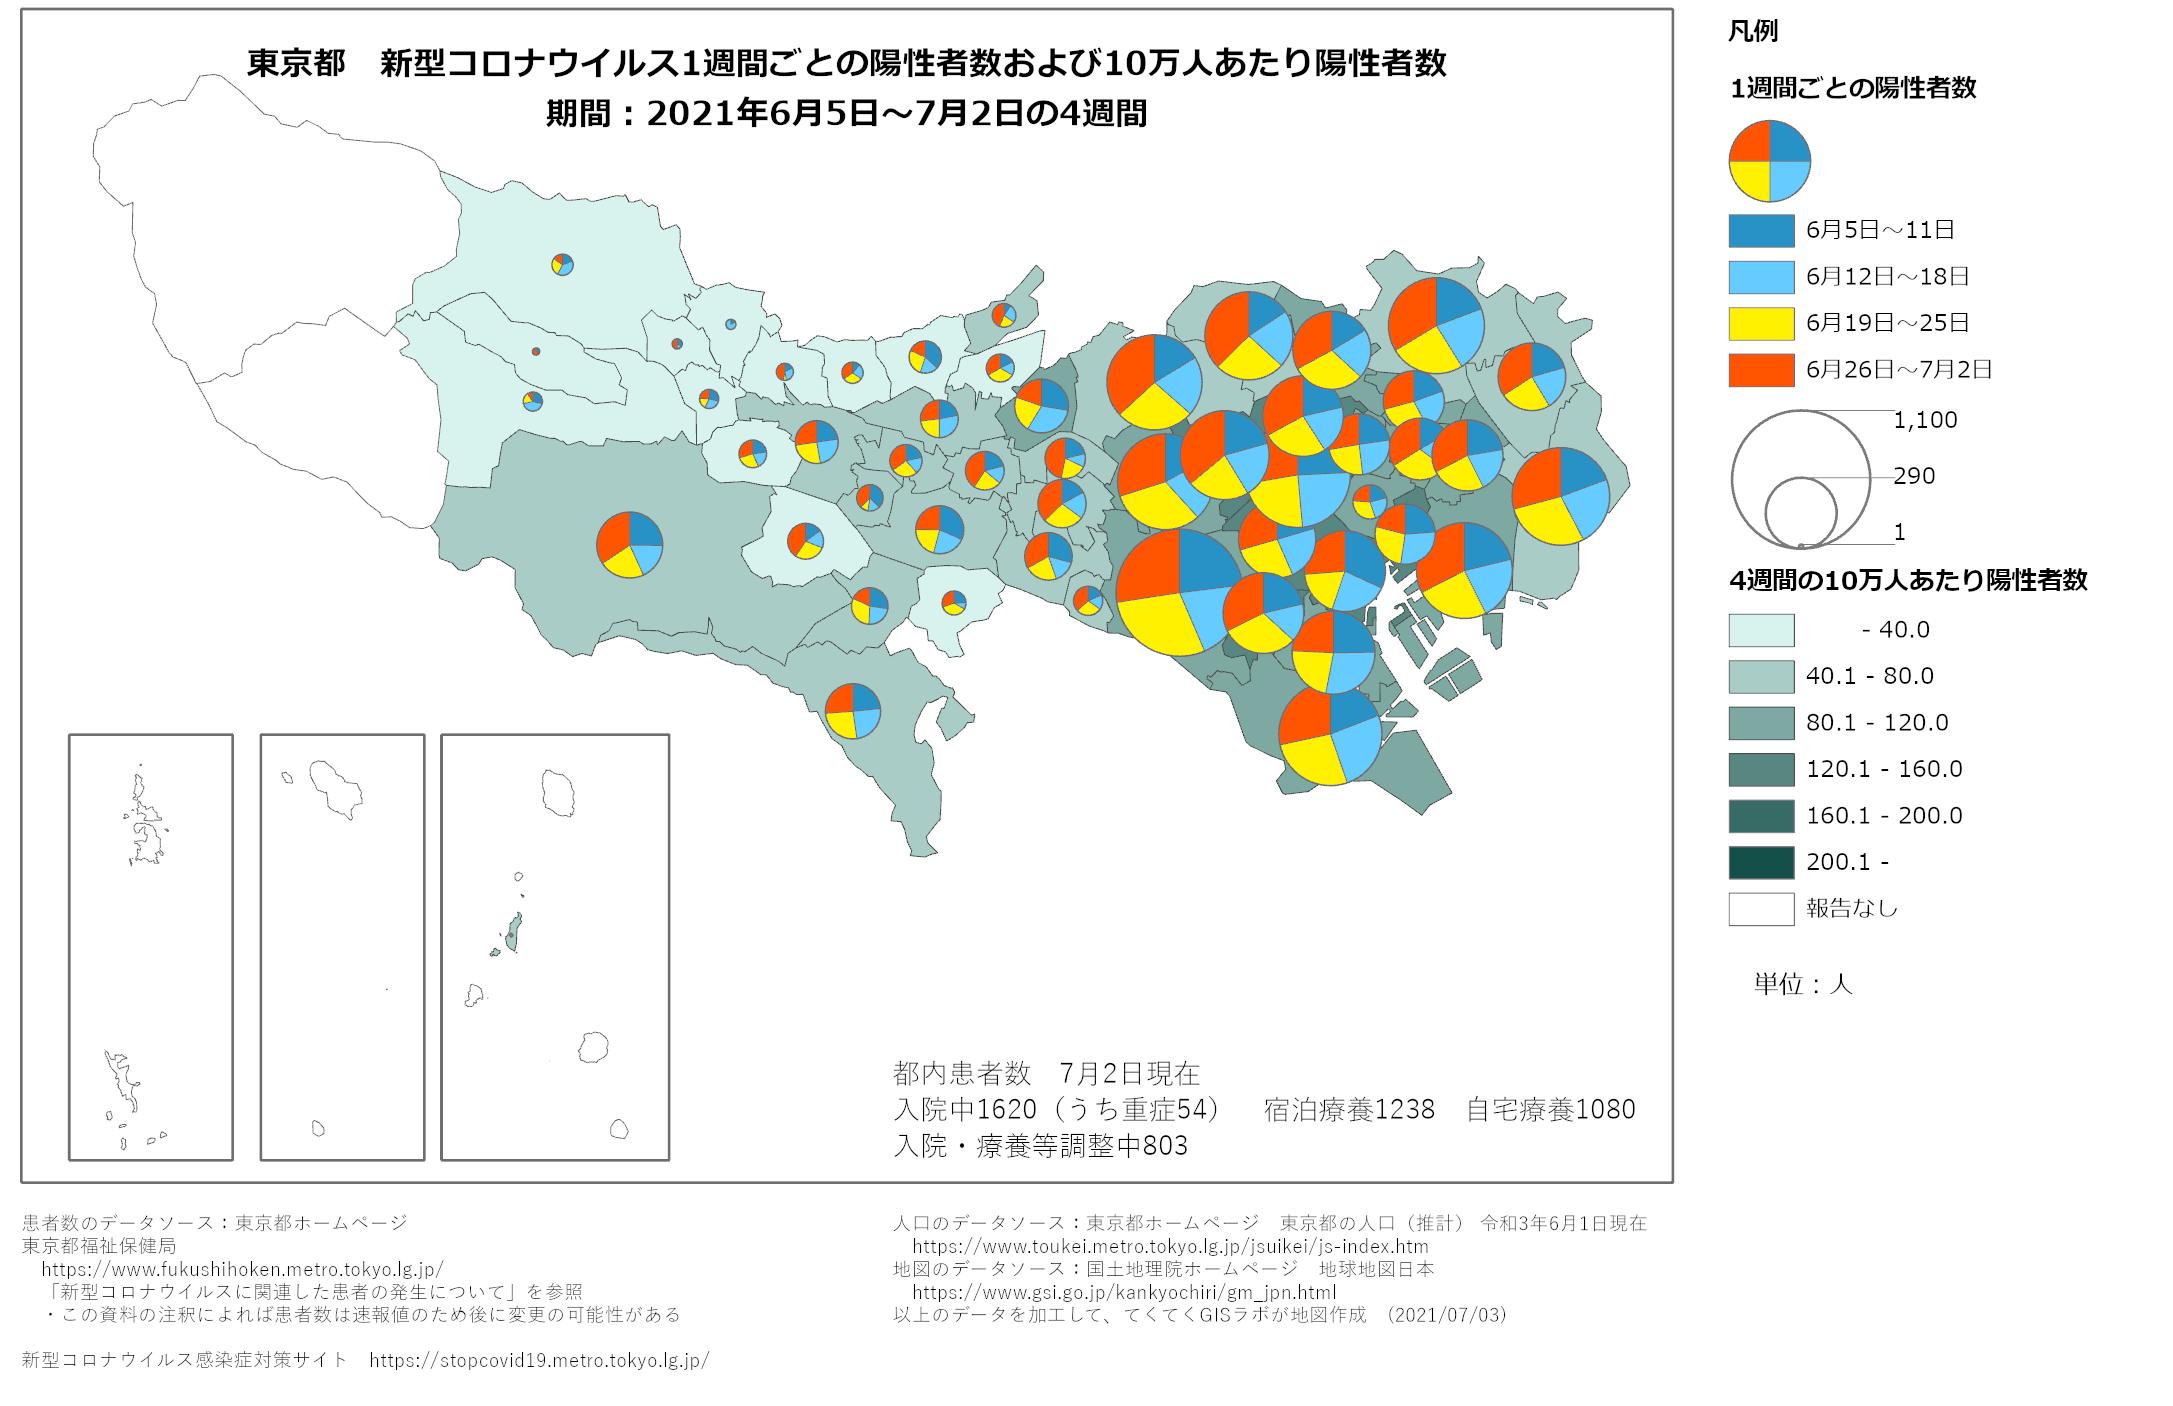 1週間ごと感染者数、東京都、6月5日〜7月2日